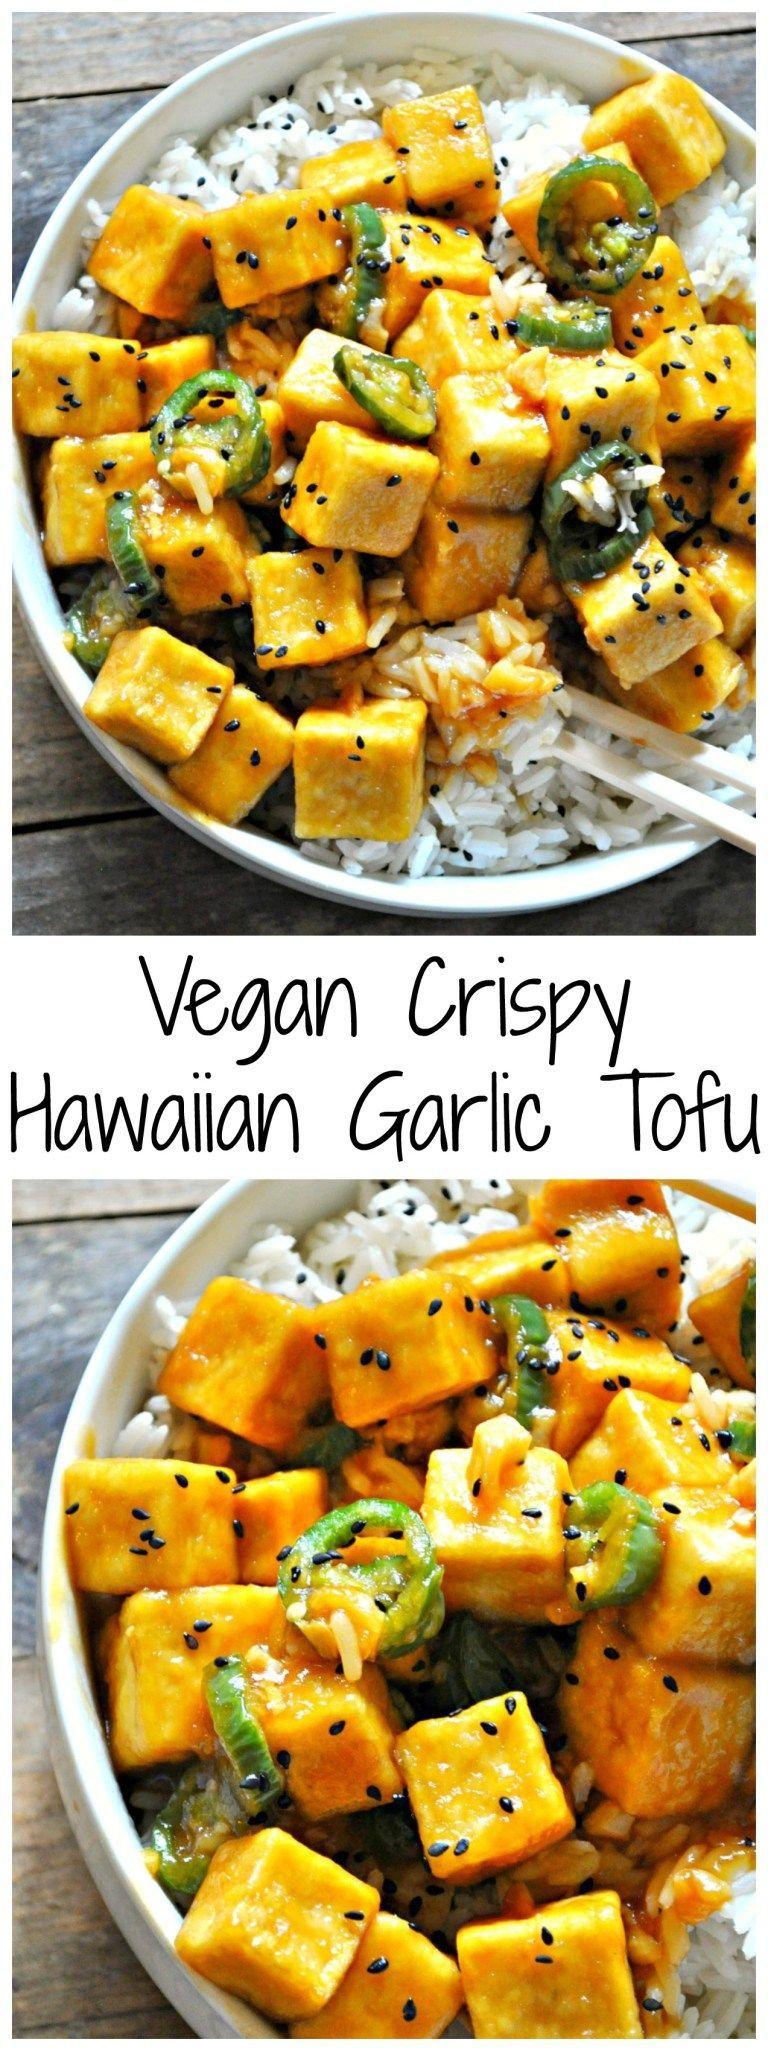 Photo of Vegan Crispy Hawaiian Garlic Tofu